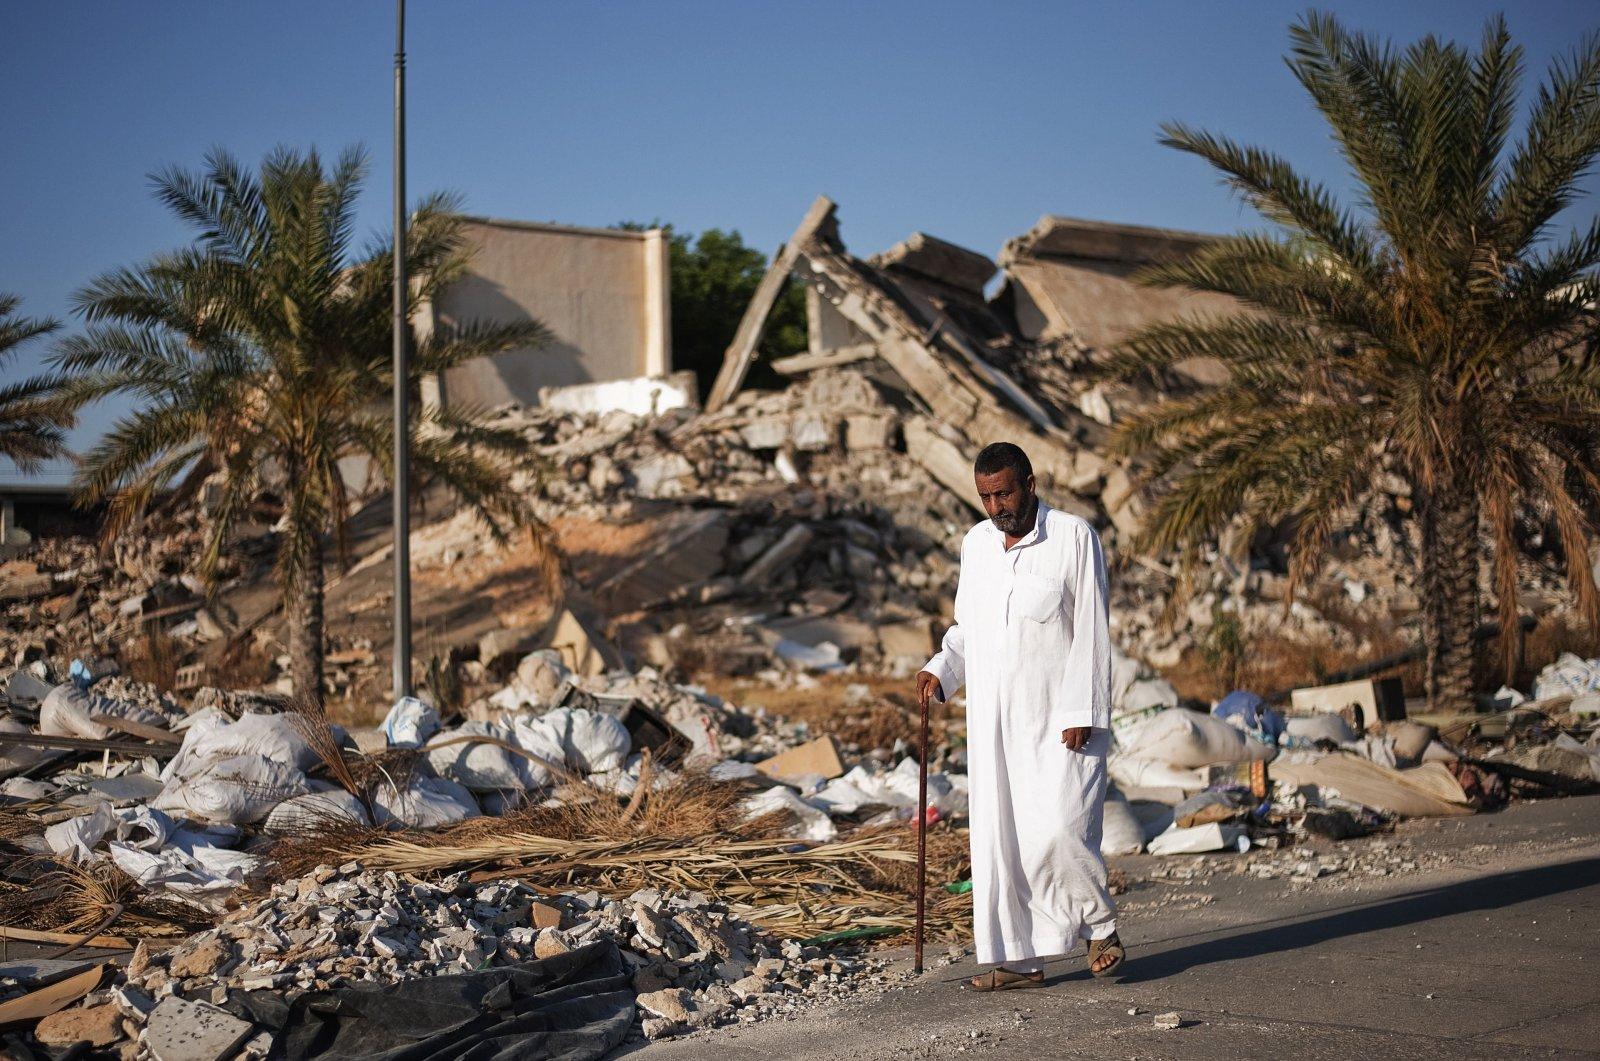 A man walks through the rubble of the destroyed compound of former Libyan leader Moammar Gadhafi, in Tripoli's Bab al-Aziziya area, Libya, June 2, 2012. (AFP File Photo)